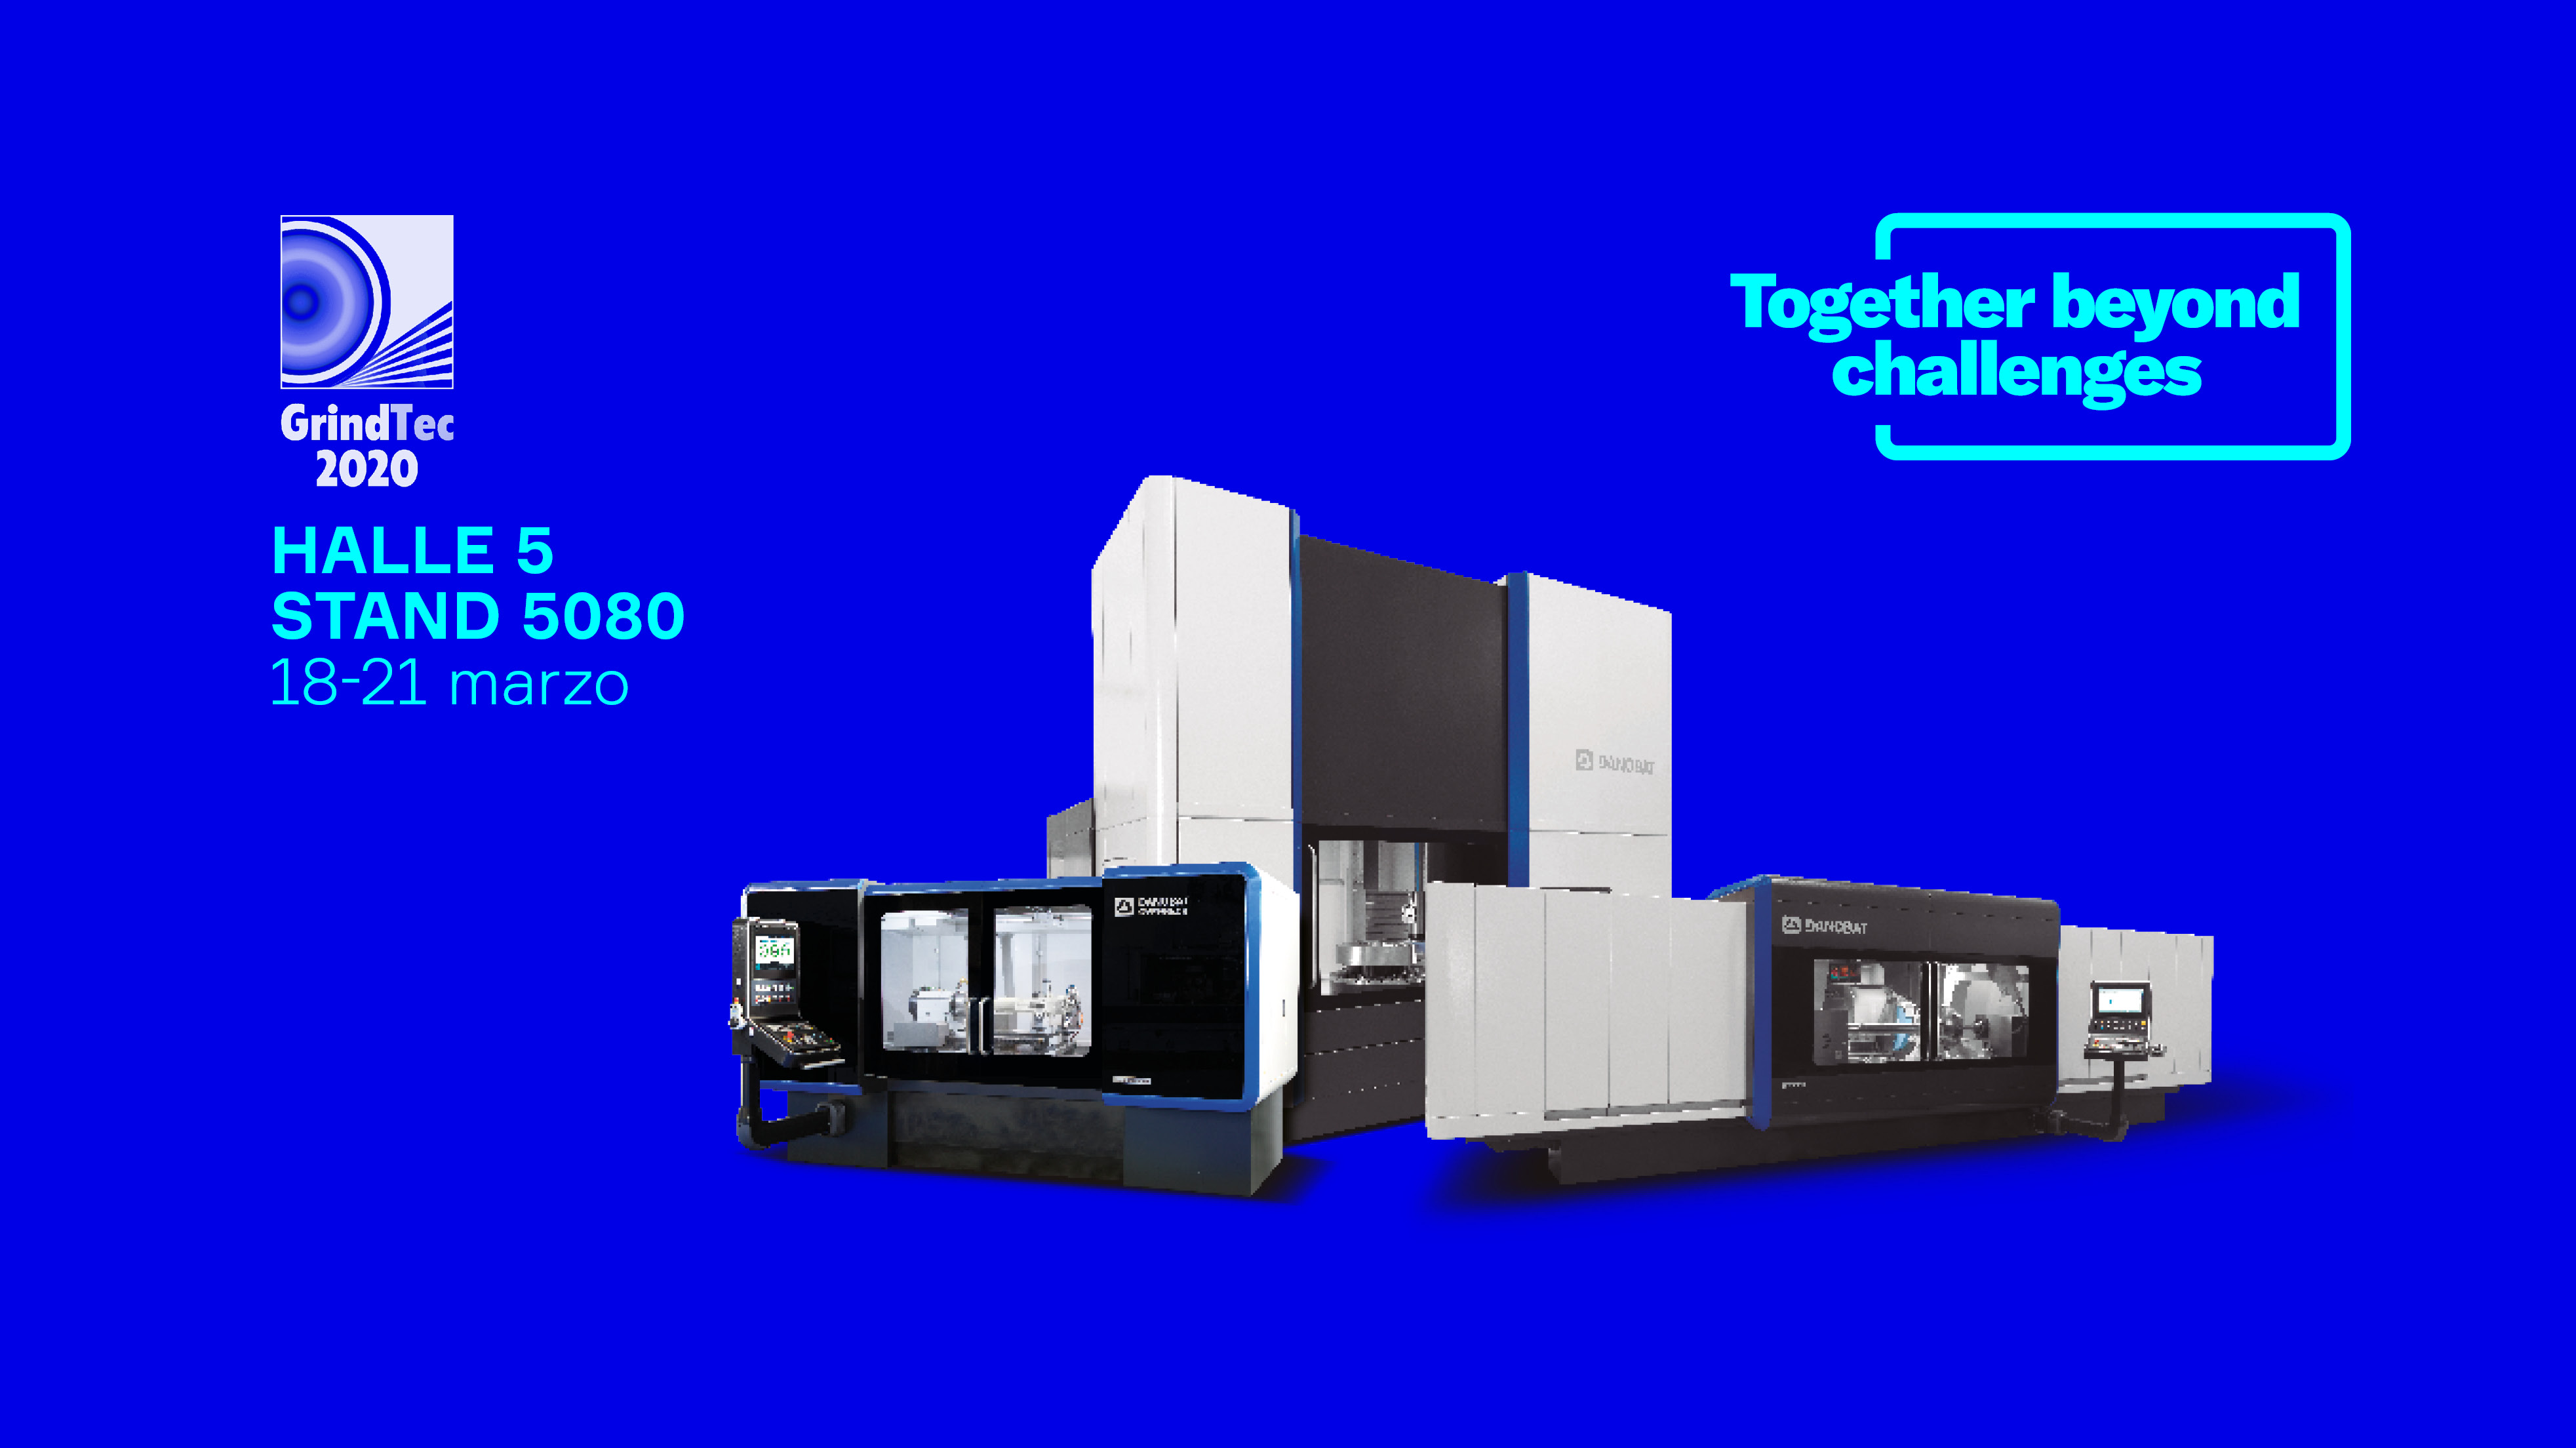 DANOBAT exhibits its latest precision solutions at the GRINDTEC